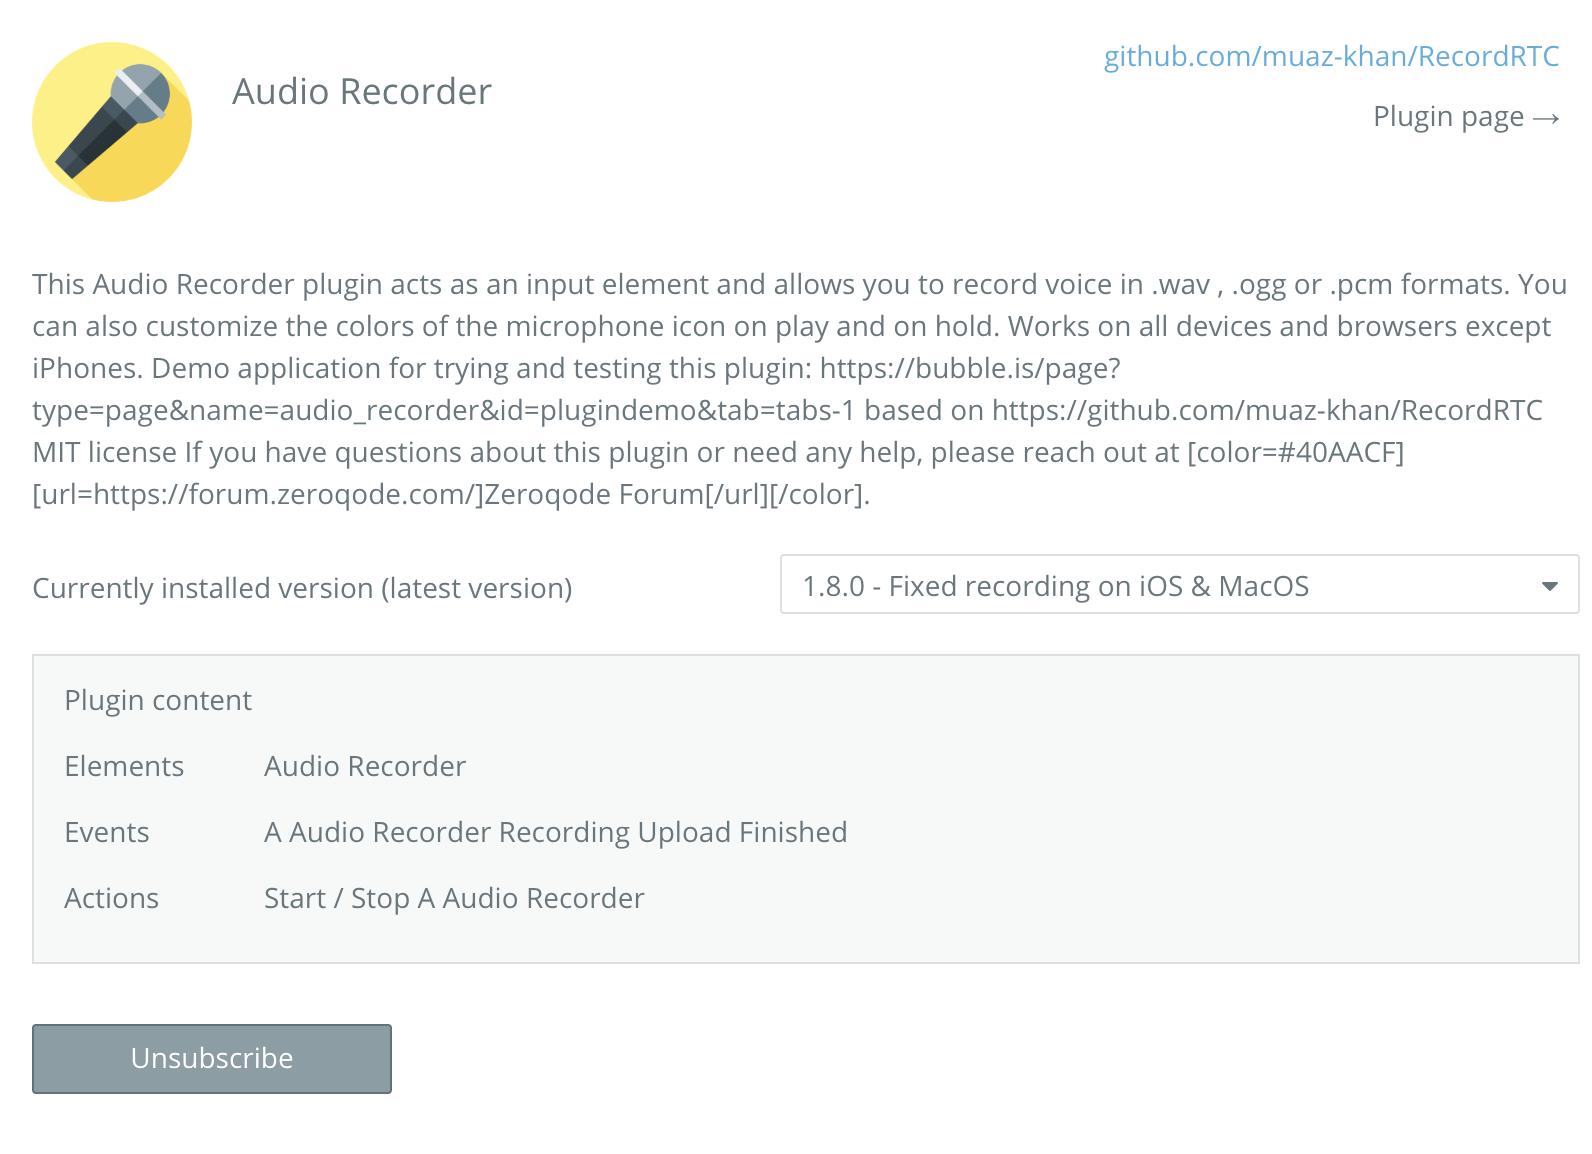 Audio Recorder - New Plugin from Zeroqode - Showcase